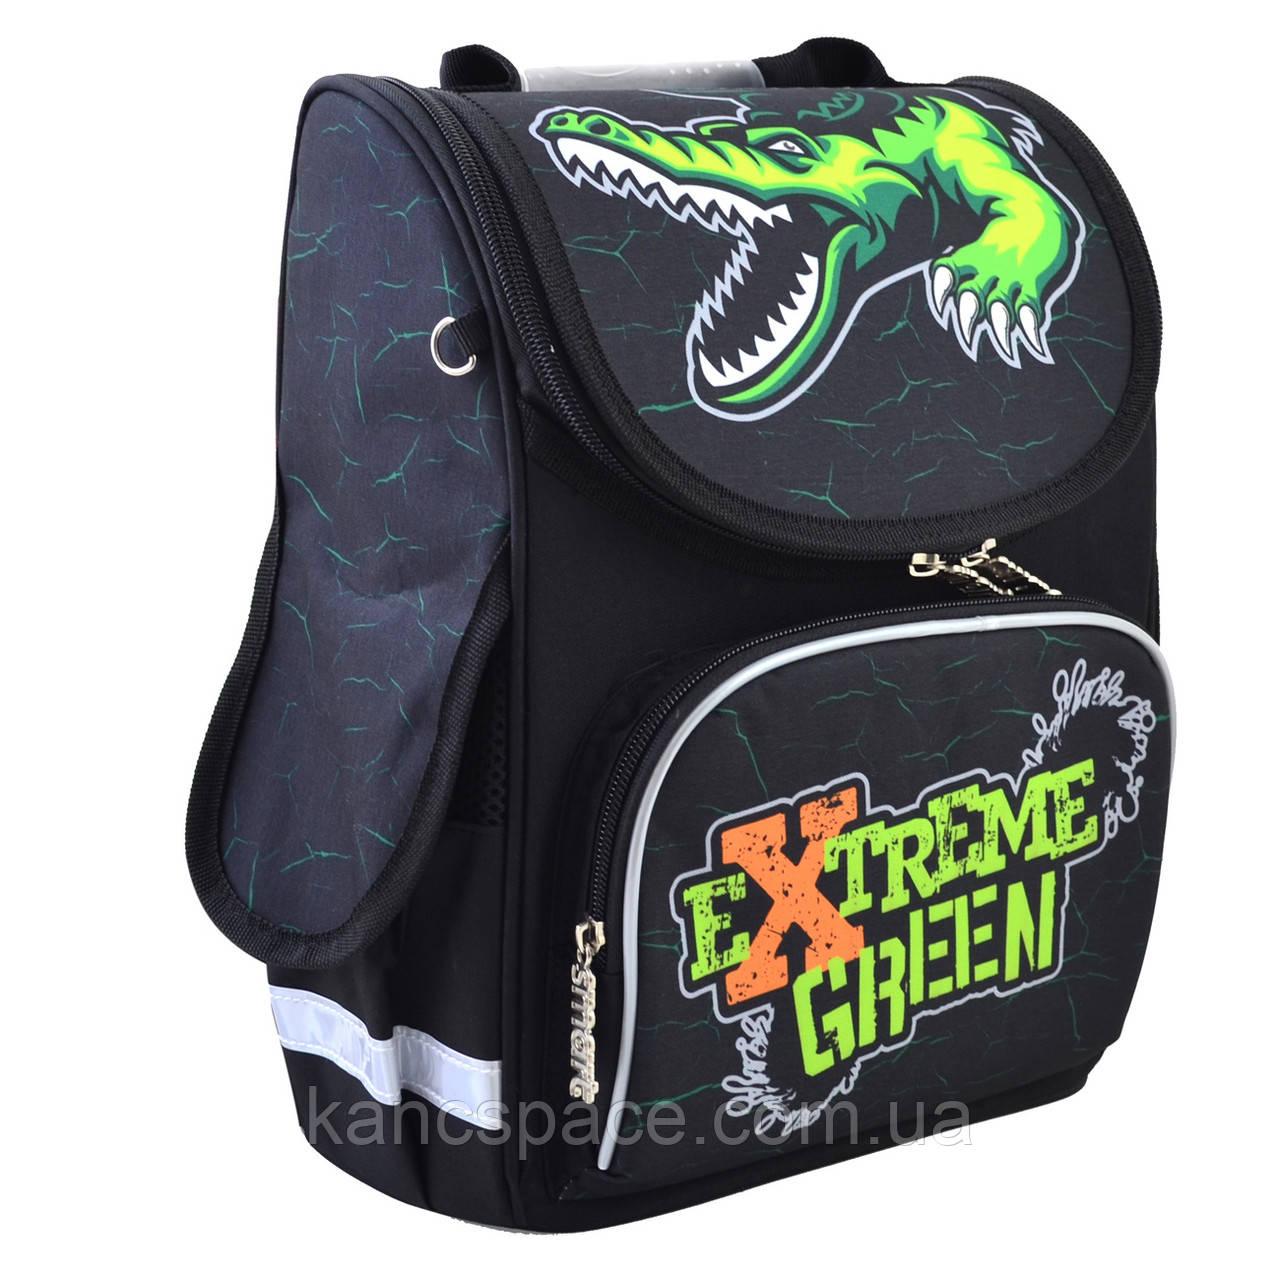 Рюкзак каркасний PG-11 Extreme green, 34*26*14